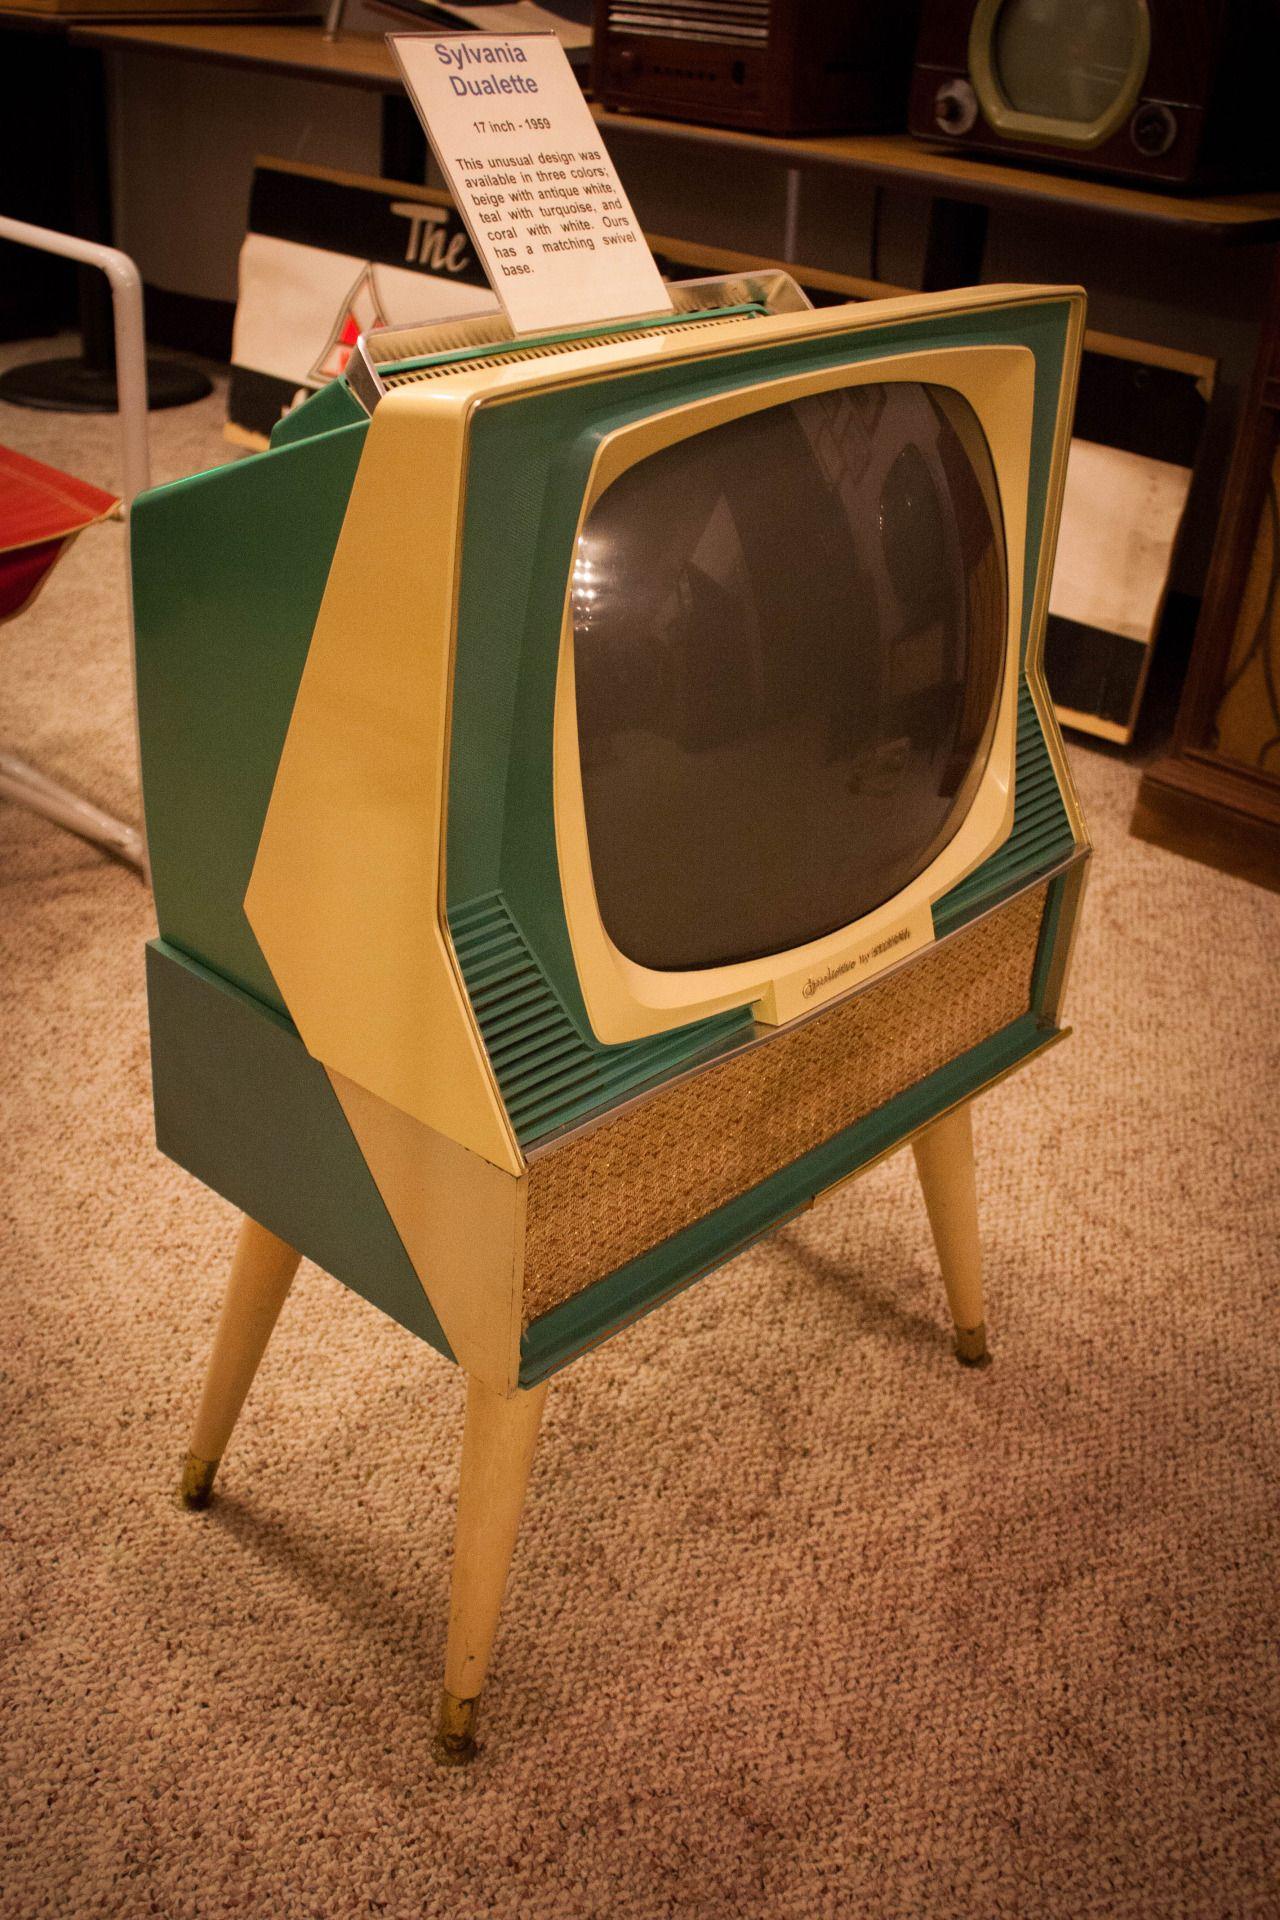 Muebles Dualette - 1959 17 Inch Sylvania Dualette Mid Century Modern Furnishings [mjhdah]https://i.pinimg.com/originals/42/f3/25/42f3257a7da0e848e1a257c639668ded.jpg